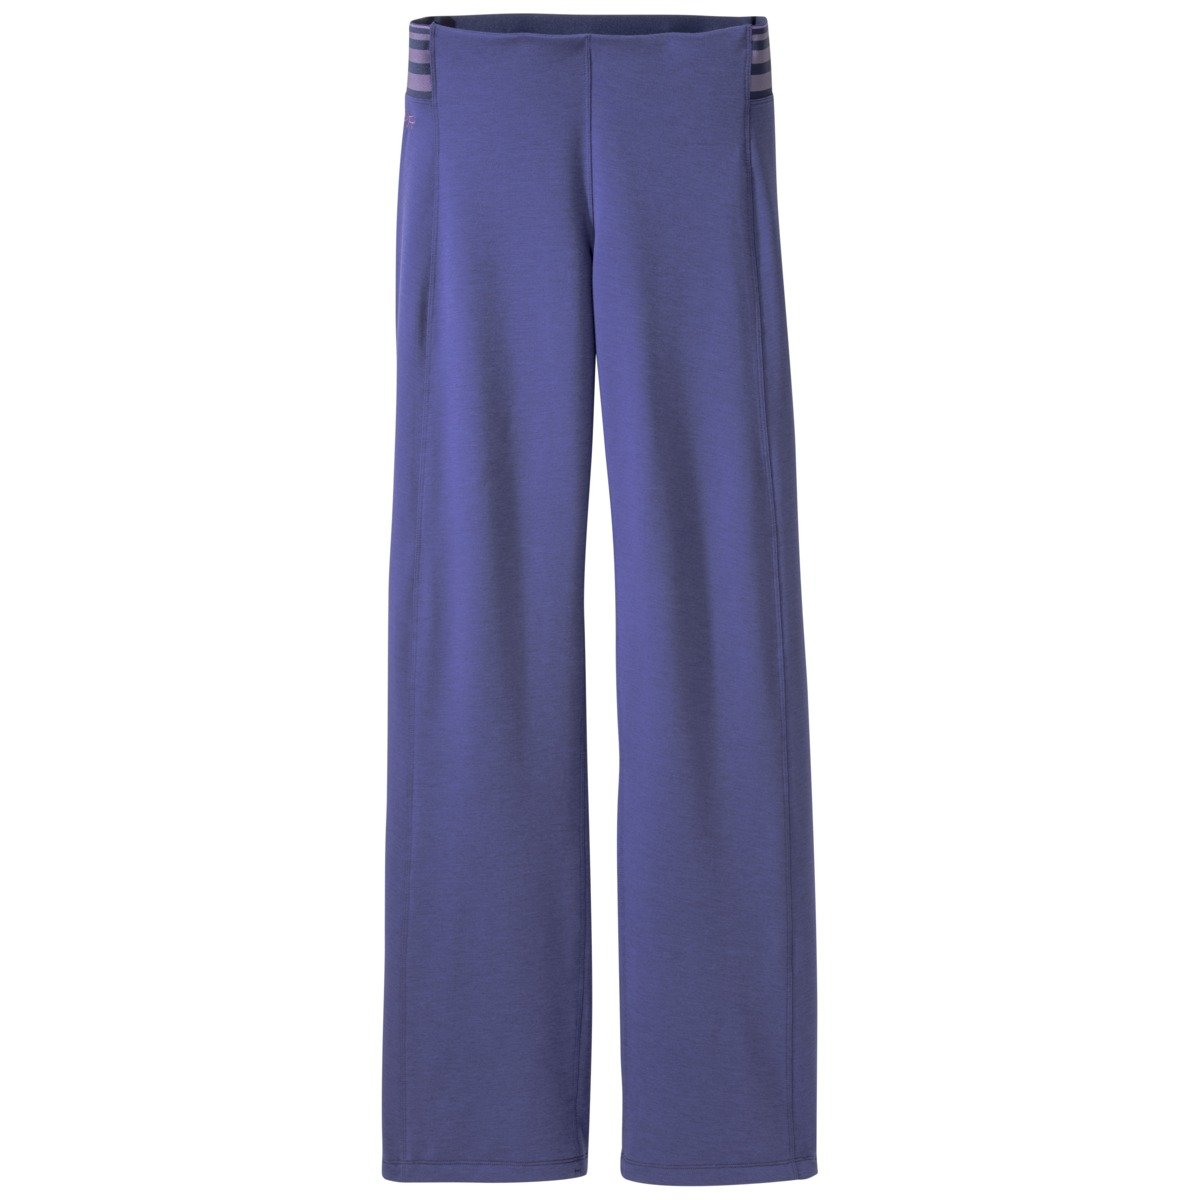 Outdoor Research Piezo Damens& 039;s Pants